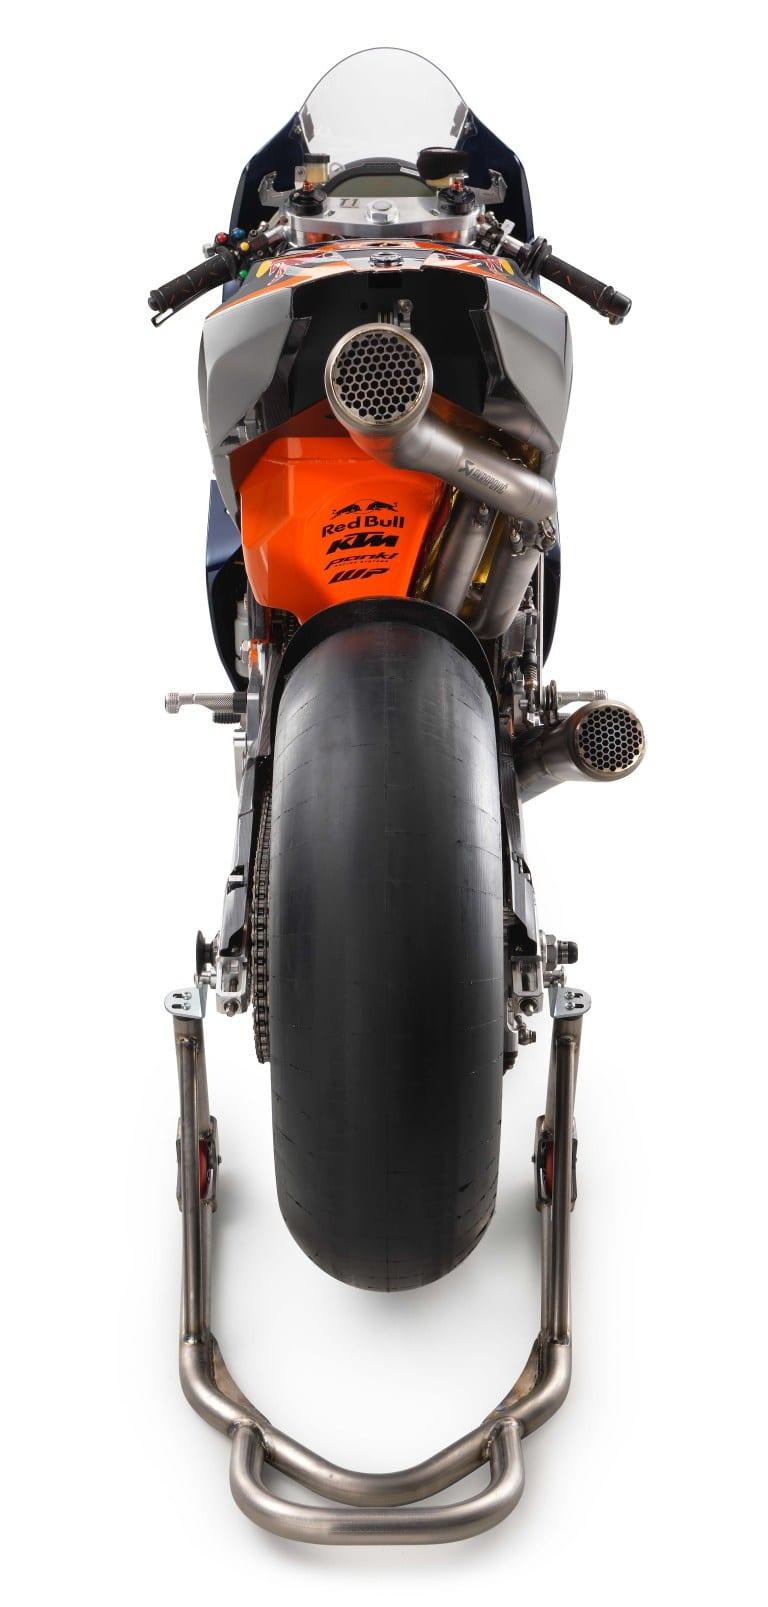 2017-ktm-rc16-motogp-official-livery-03